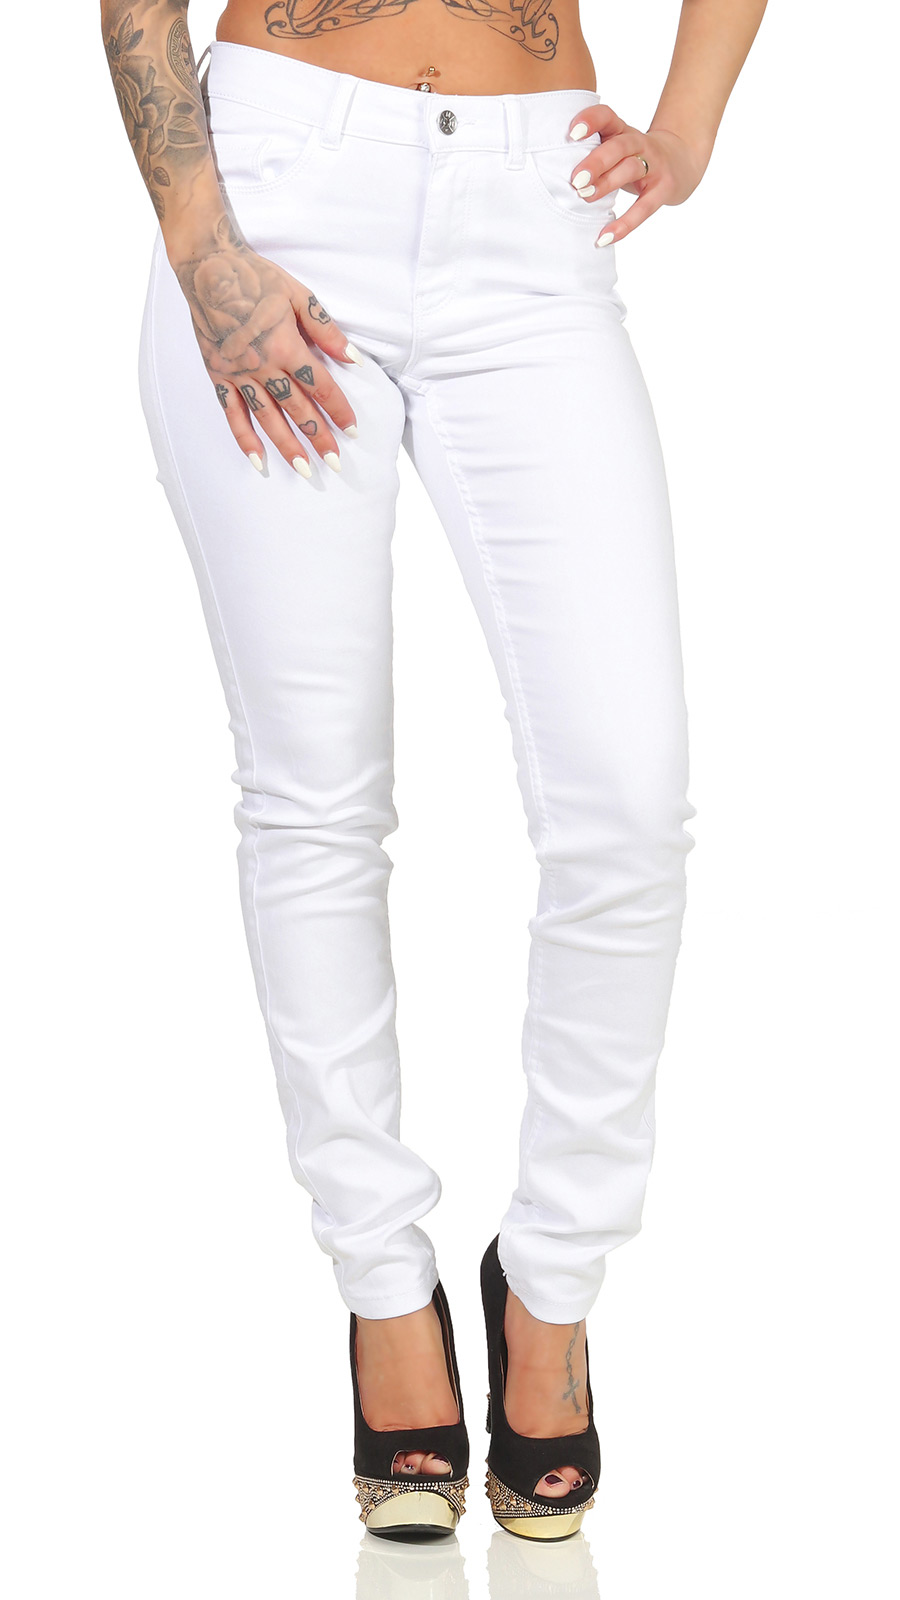 Vero Moda Damen Jeans Hose Skinny Damenjeans Röhrenjeans Jeanshose Seven weiß